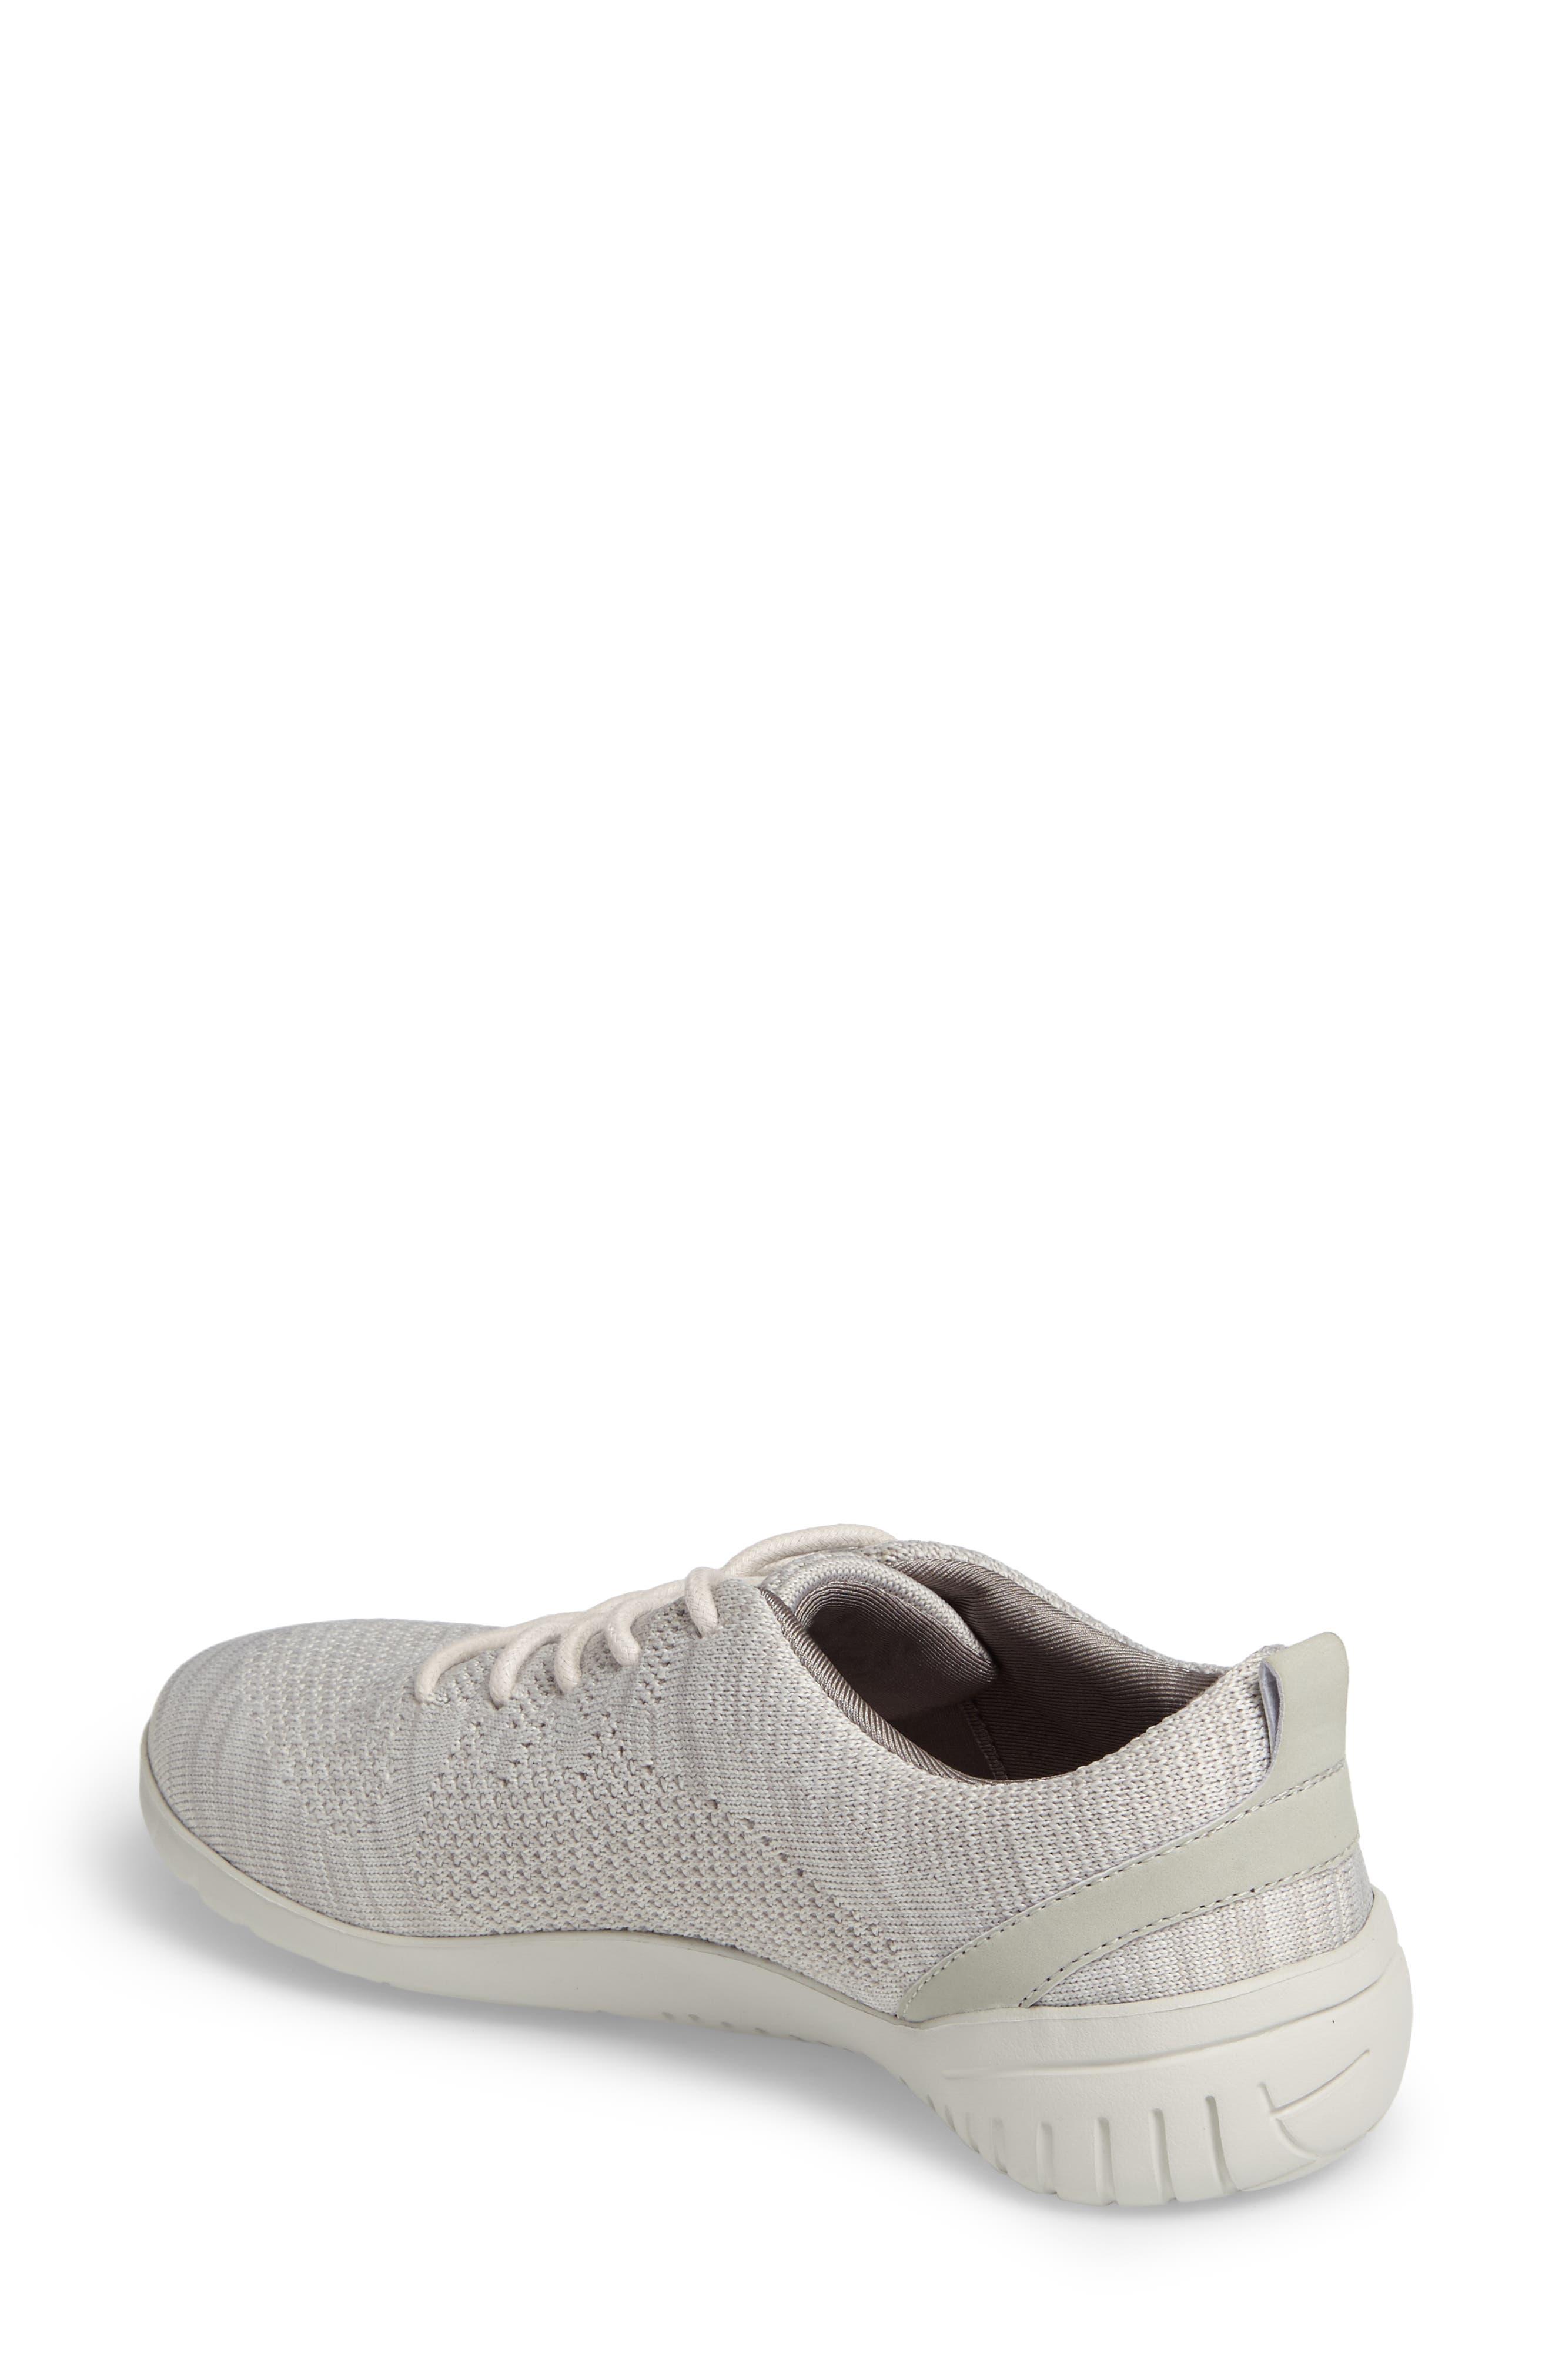 Raelyn Knit Sneaker,                             Alternate thumbnail 2, color,                             Cloud Fabric